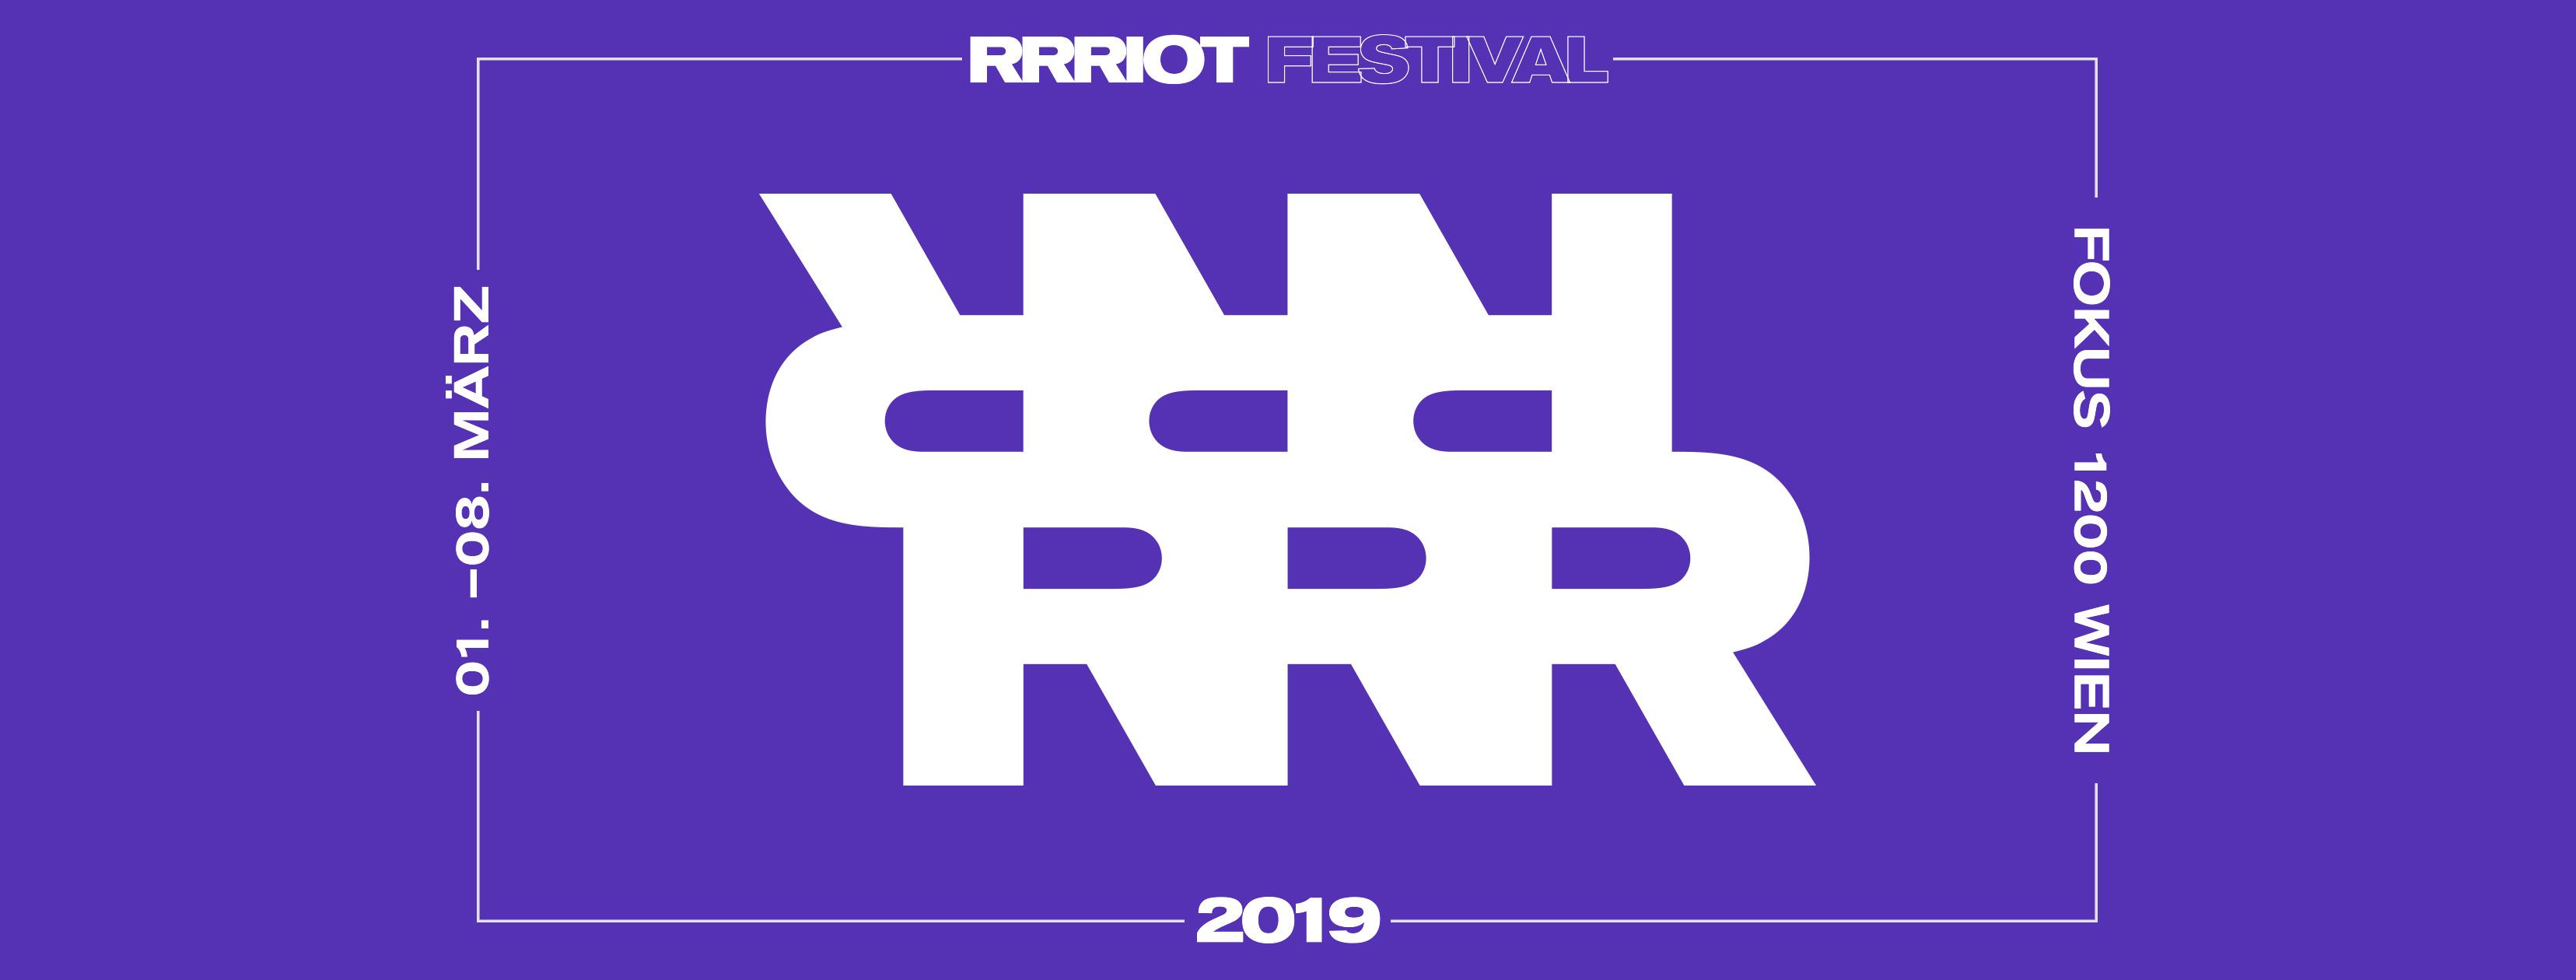 Rrriot Festival 2019